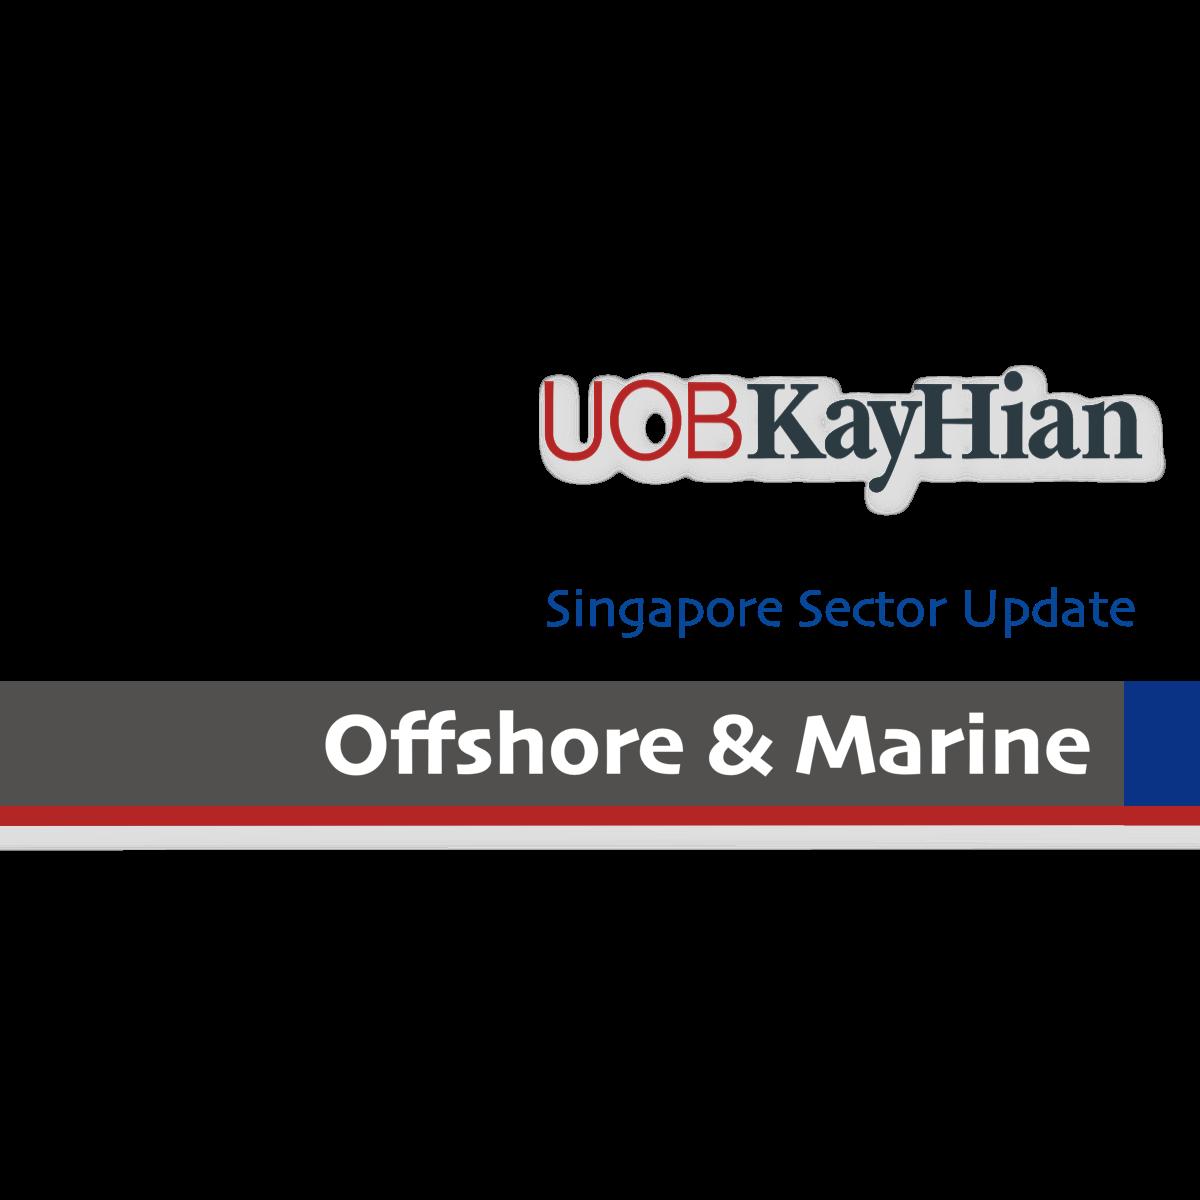 Singapore Offshore & Marine Stocks - UOB Kay Hian | SGinvestors.io